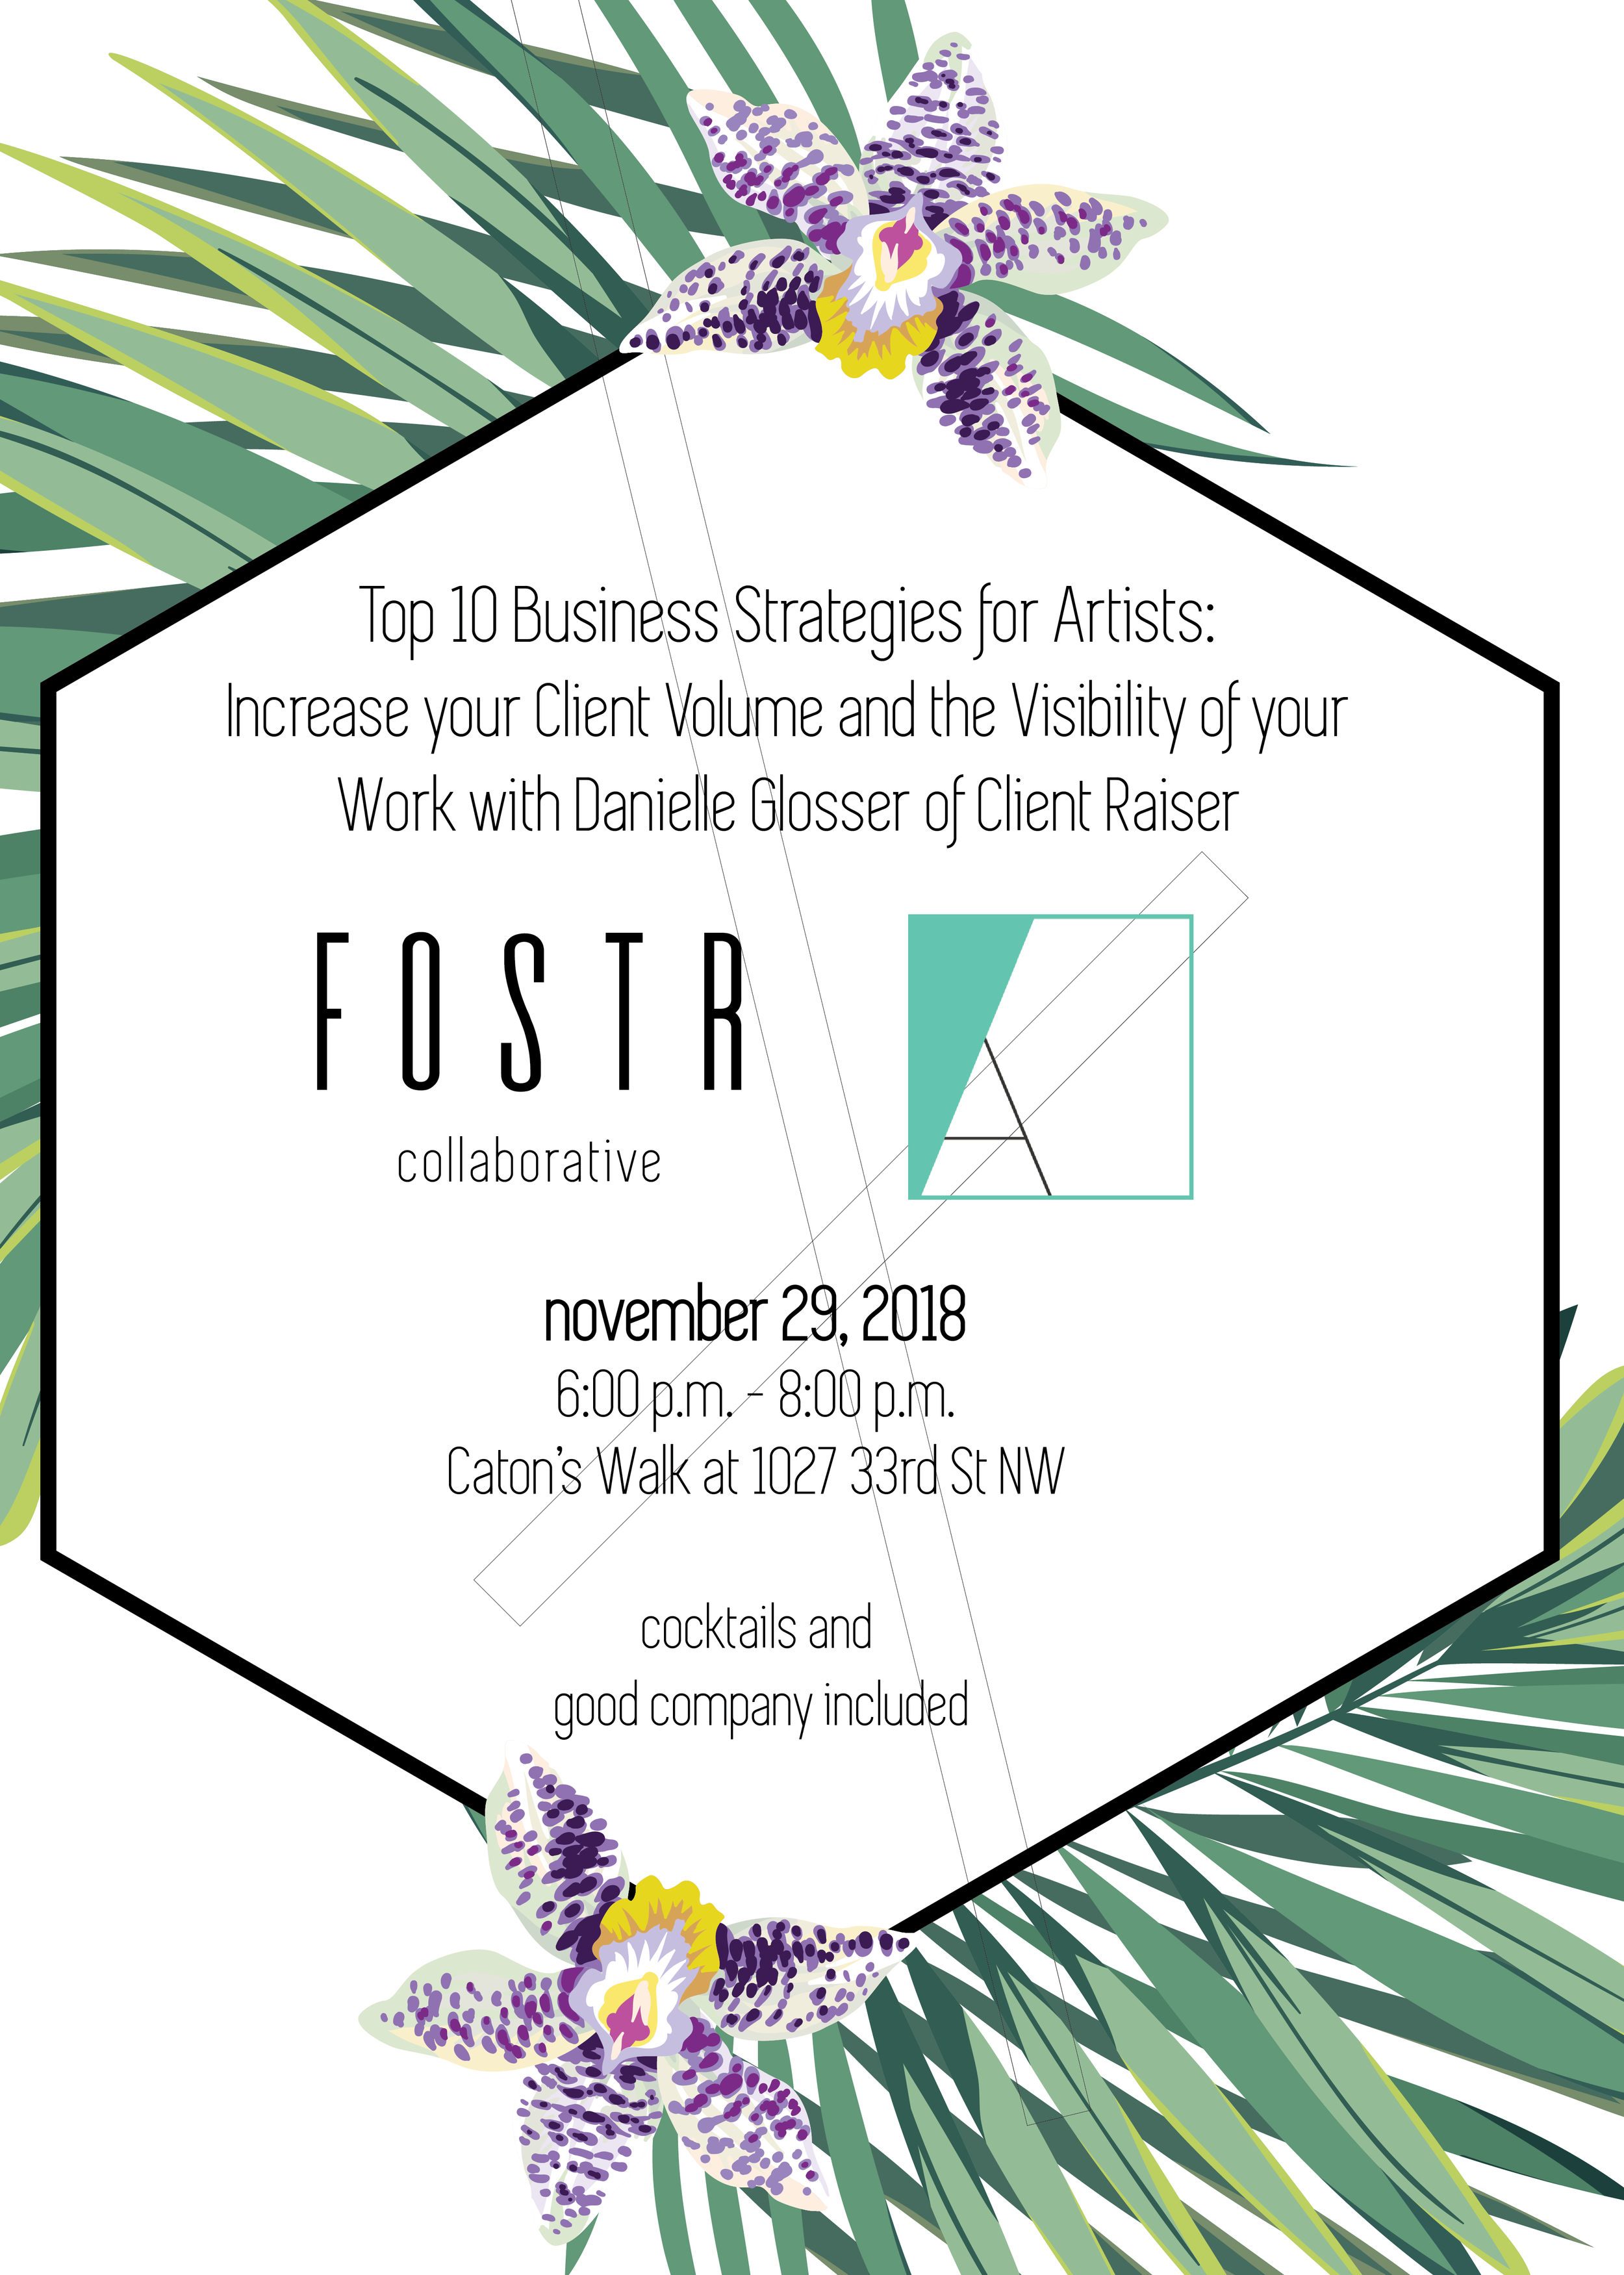 fostr_workshop_graphics artsee 20181129-01.png